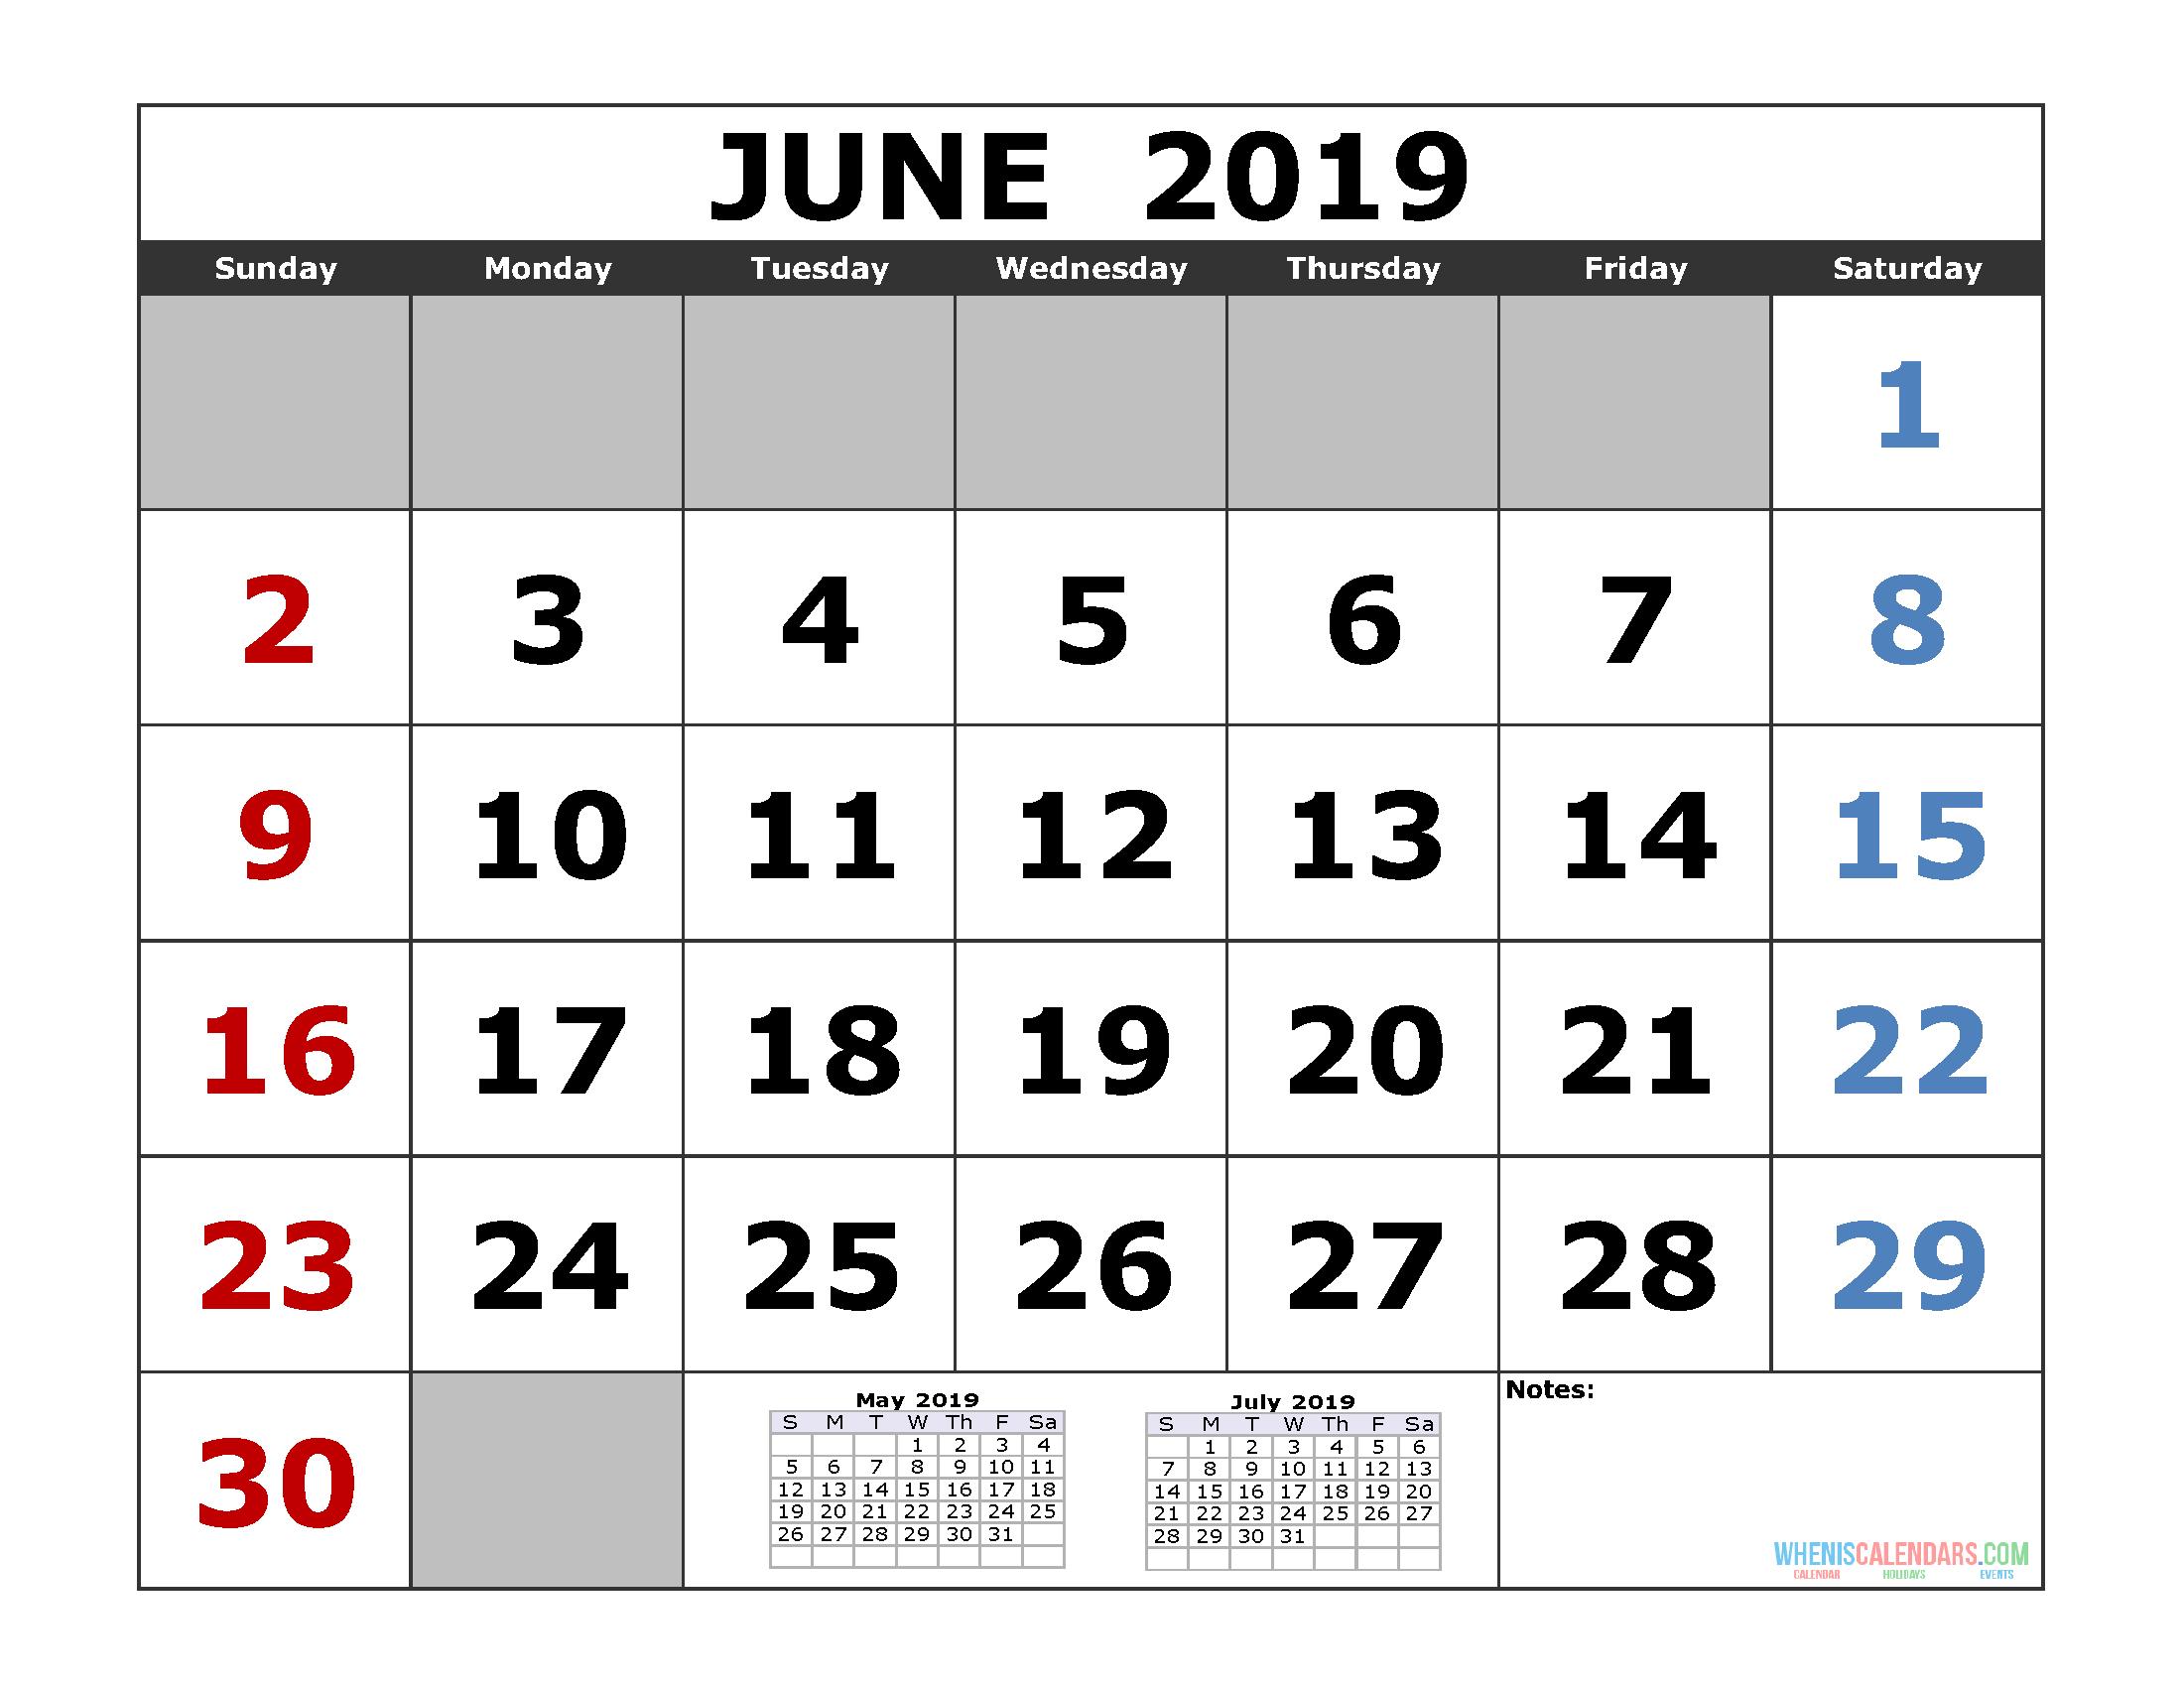 June 2019 Printable Calendar Template (3 Month Calendar) | Free inside Printable 3 Month April May June Calendar Template